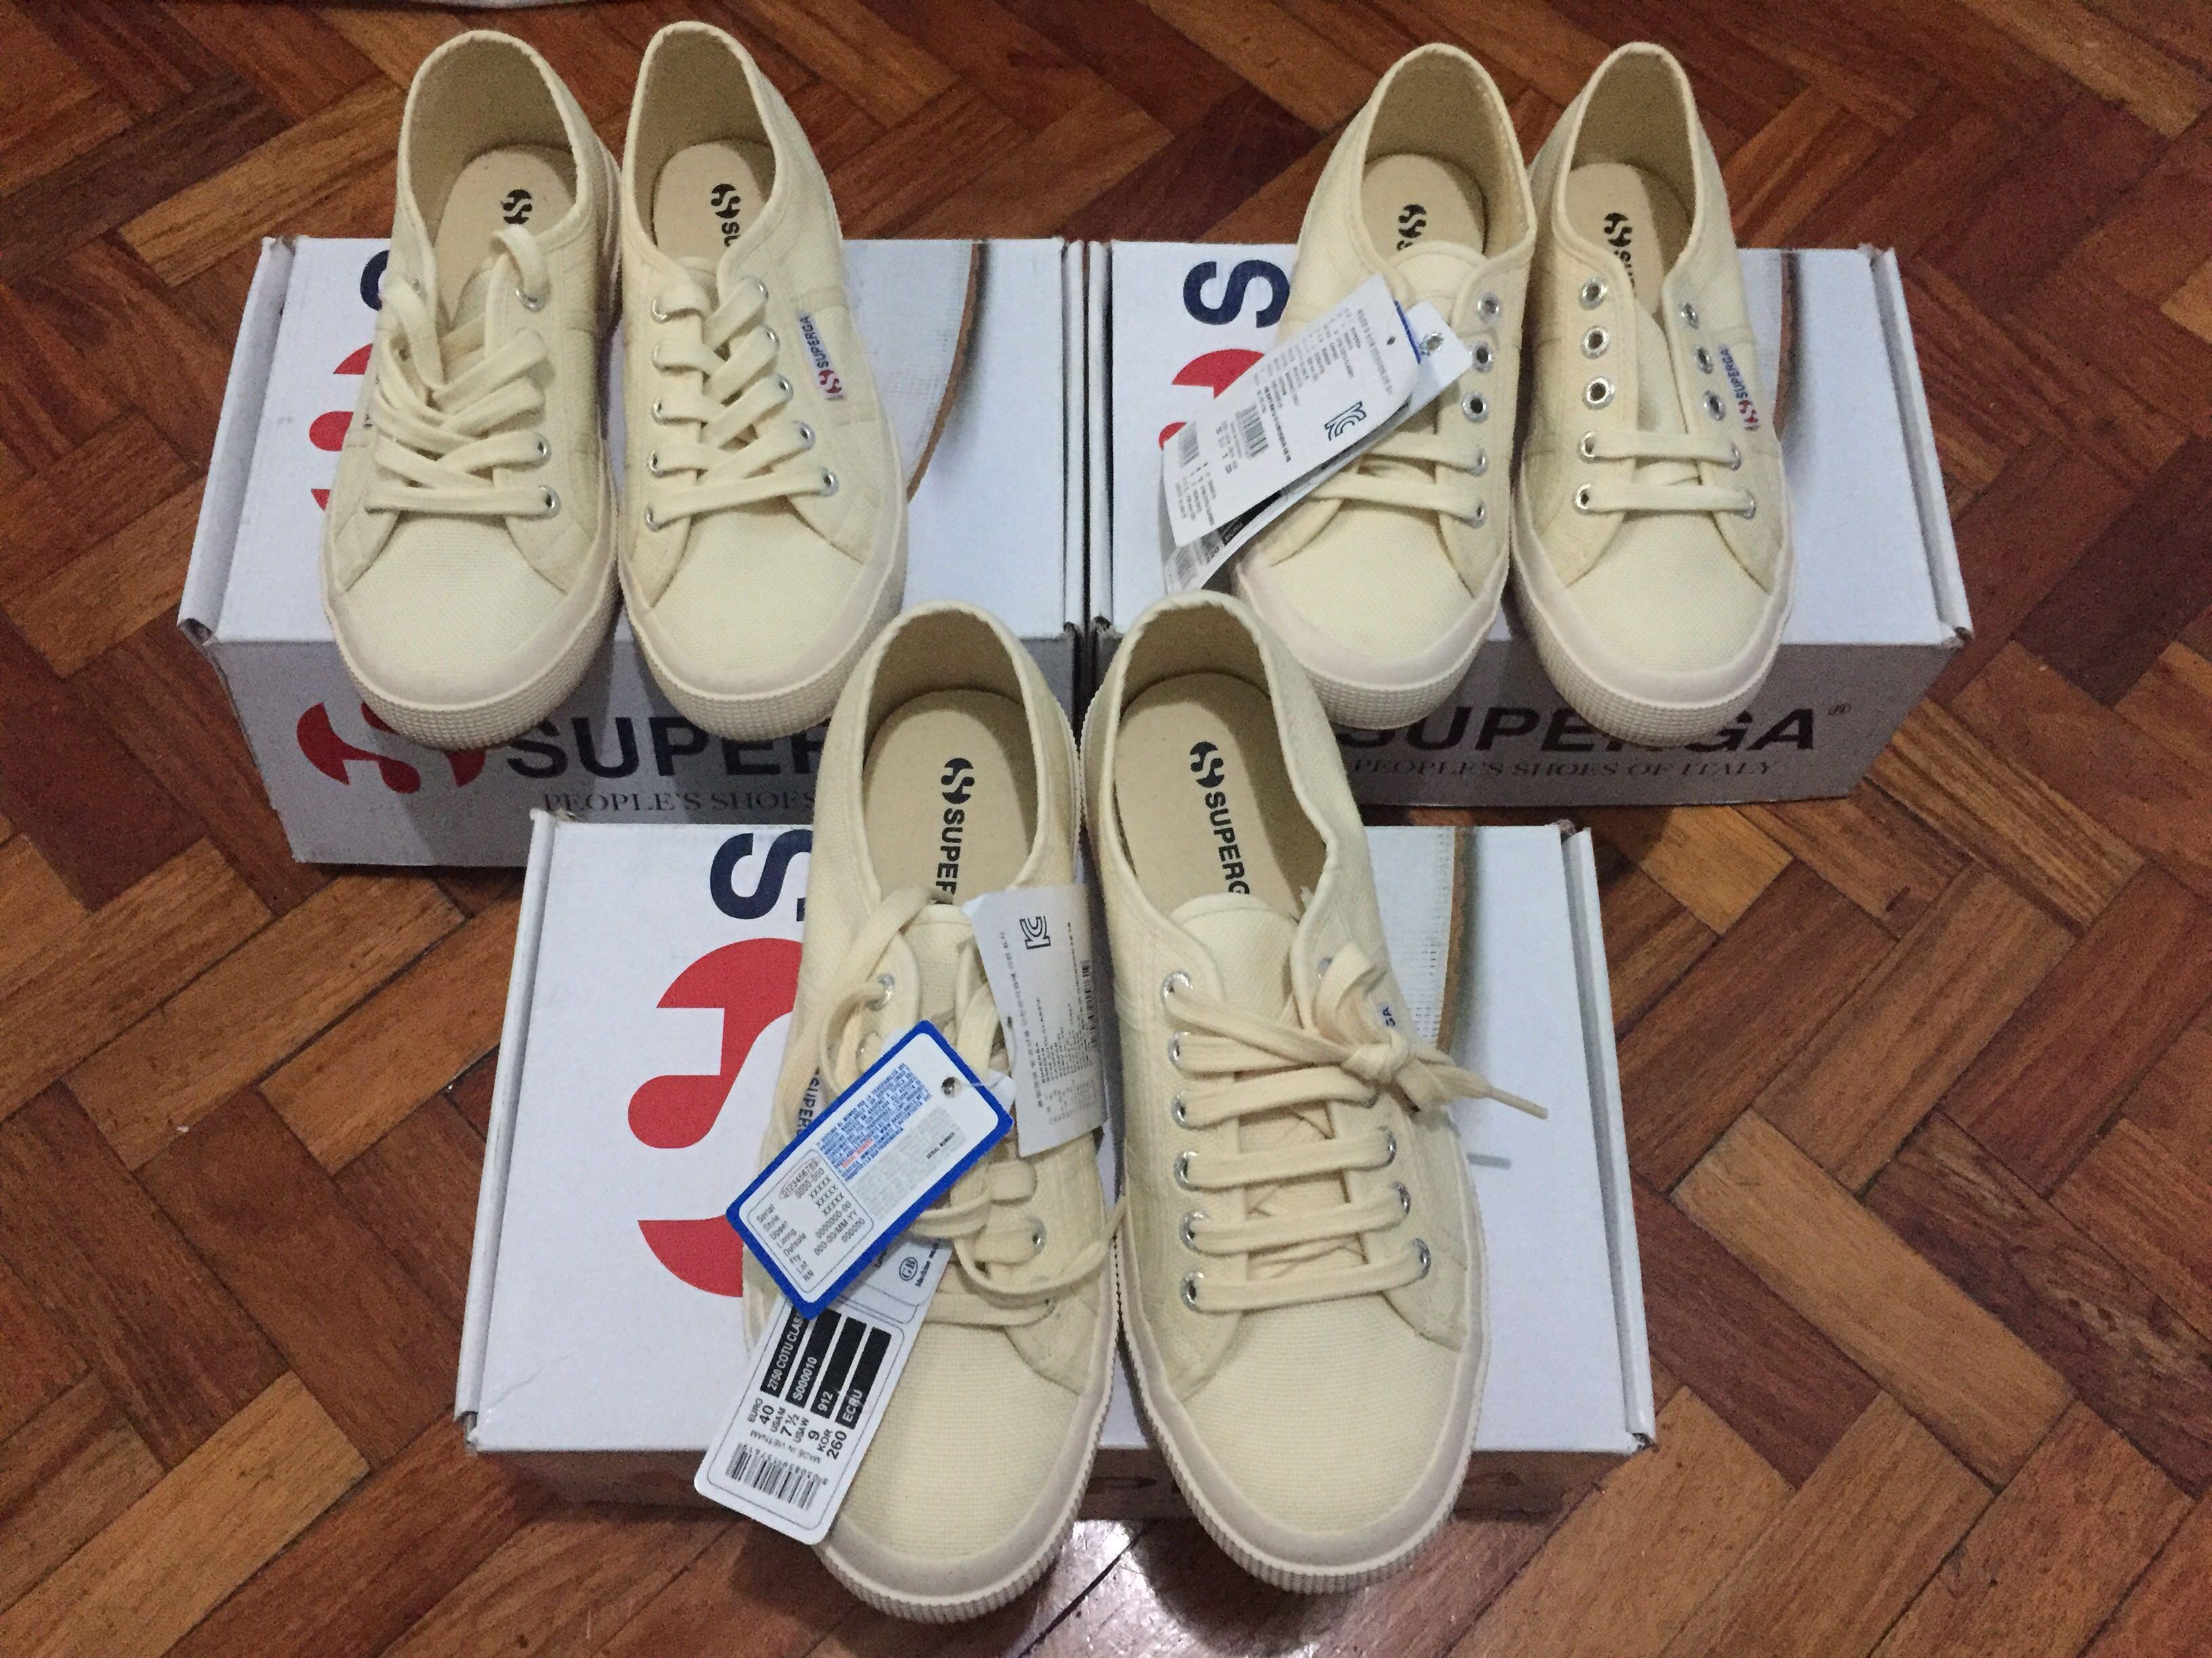 ab54d4b5a3b1d BN Superga Shoes